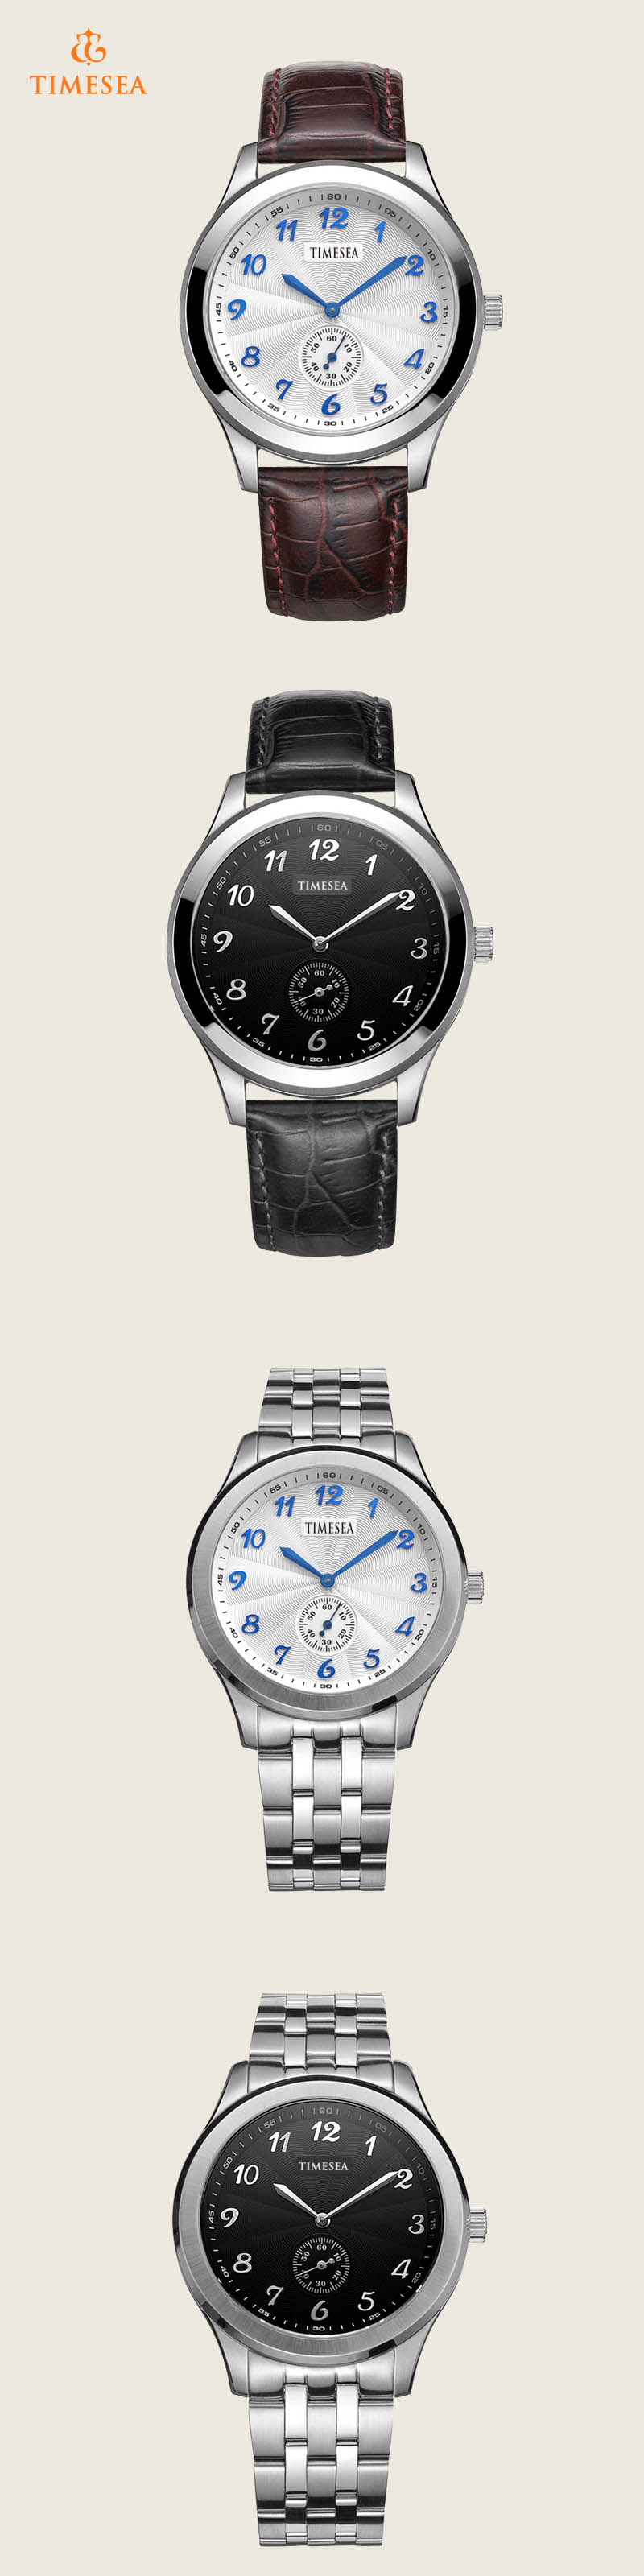 Men's Casual Wrist Watch Leather Strap Quartz Watch 72312